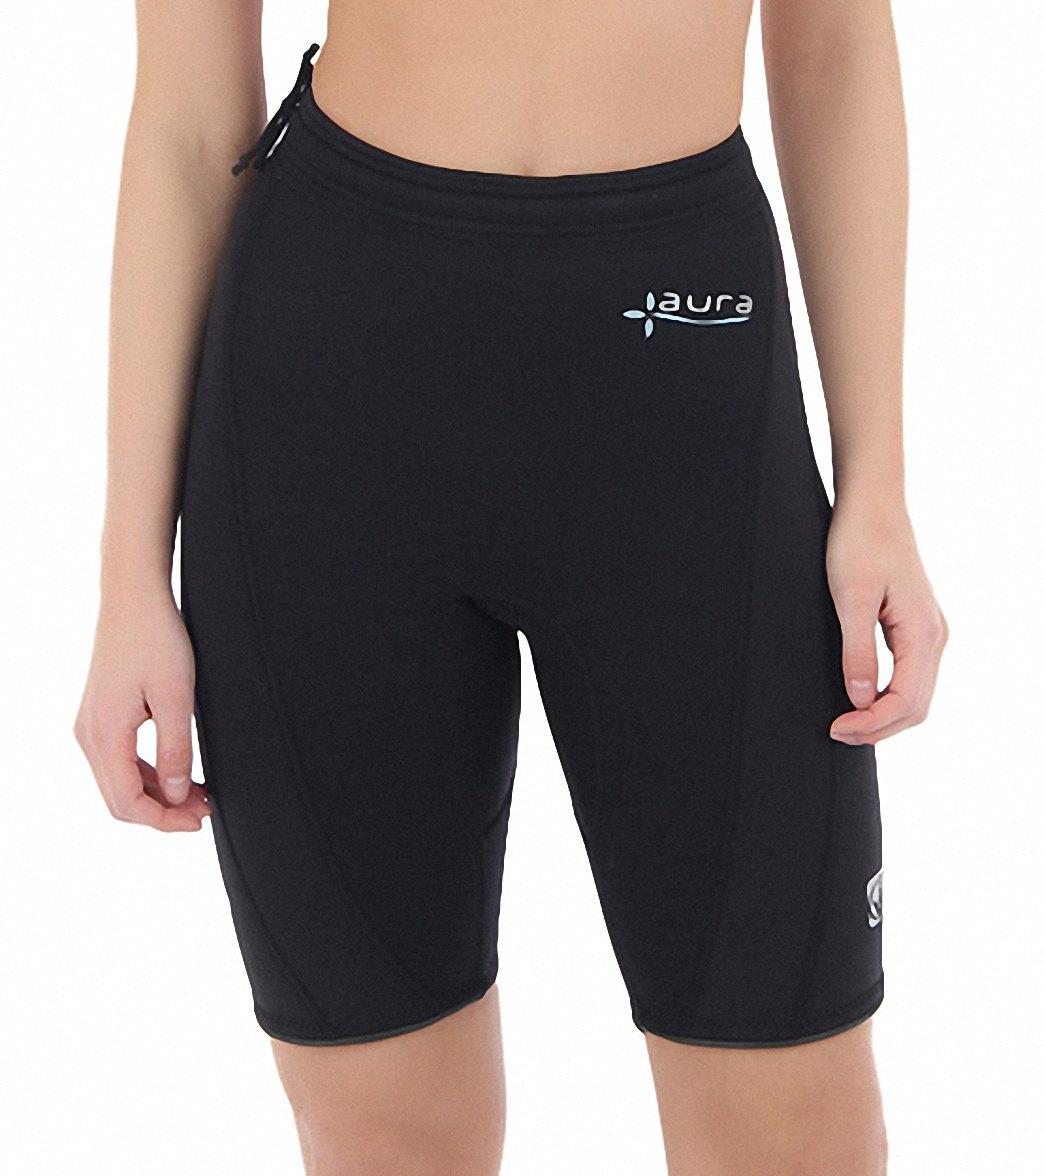 Body Glove Women s Aura 2 1MM Neoprene Wetsuit Shorts at SwimOutlet.com 8d03d7fa2c62